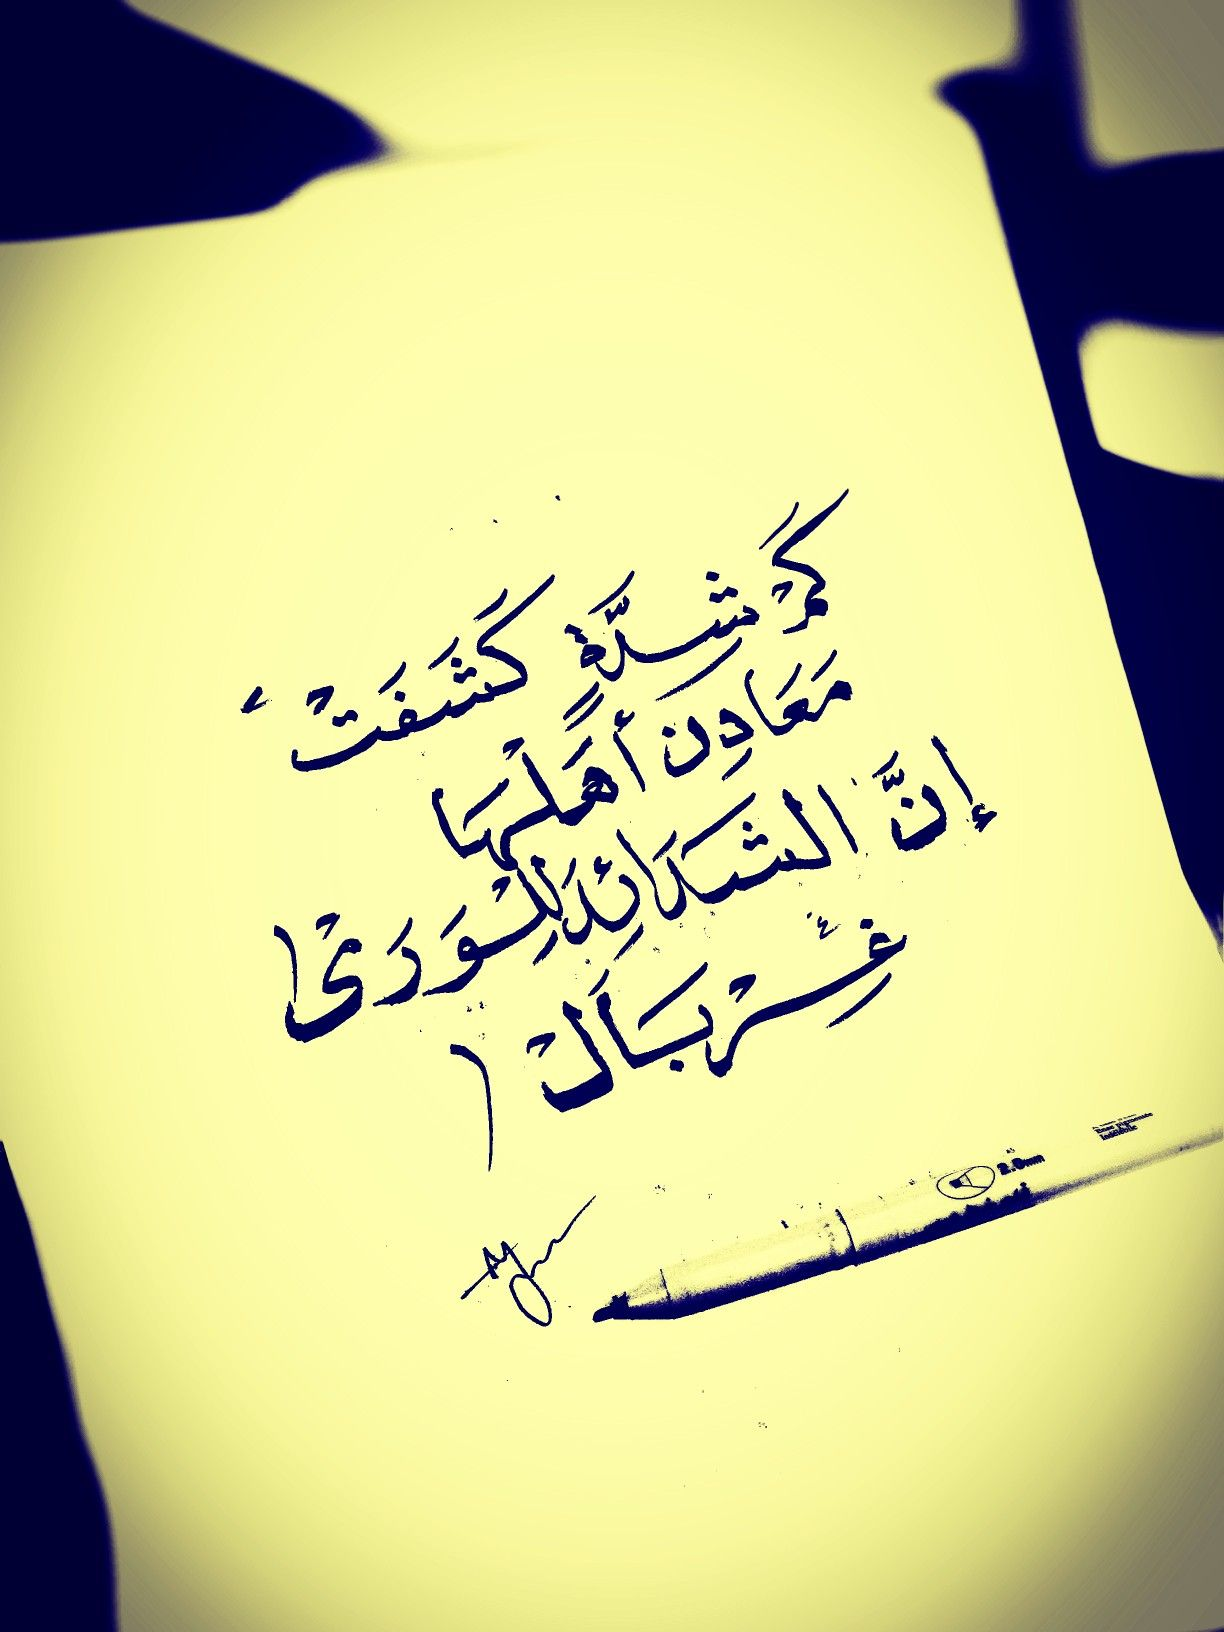 كم شدة كشفت معادن اهلها ان الشدائد للورى غربال Arabic Calligraphy Calligraphy